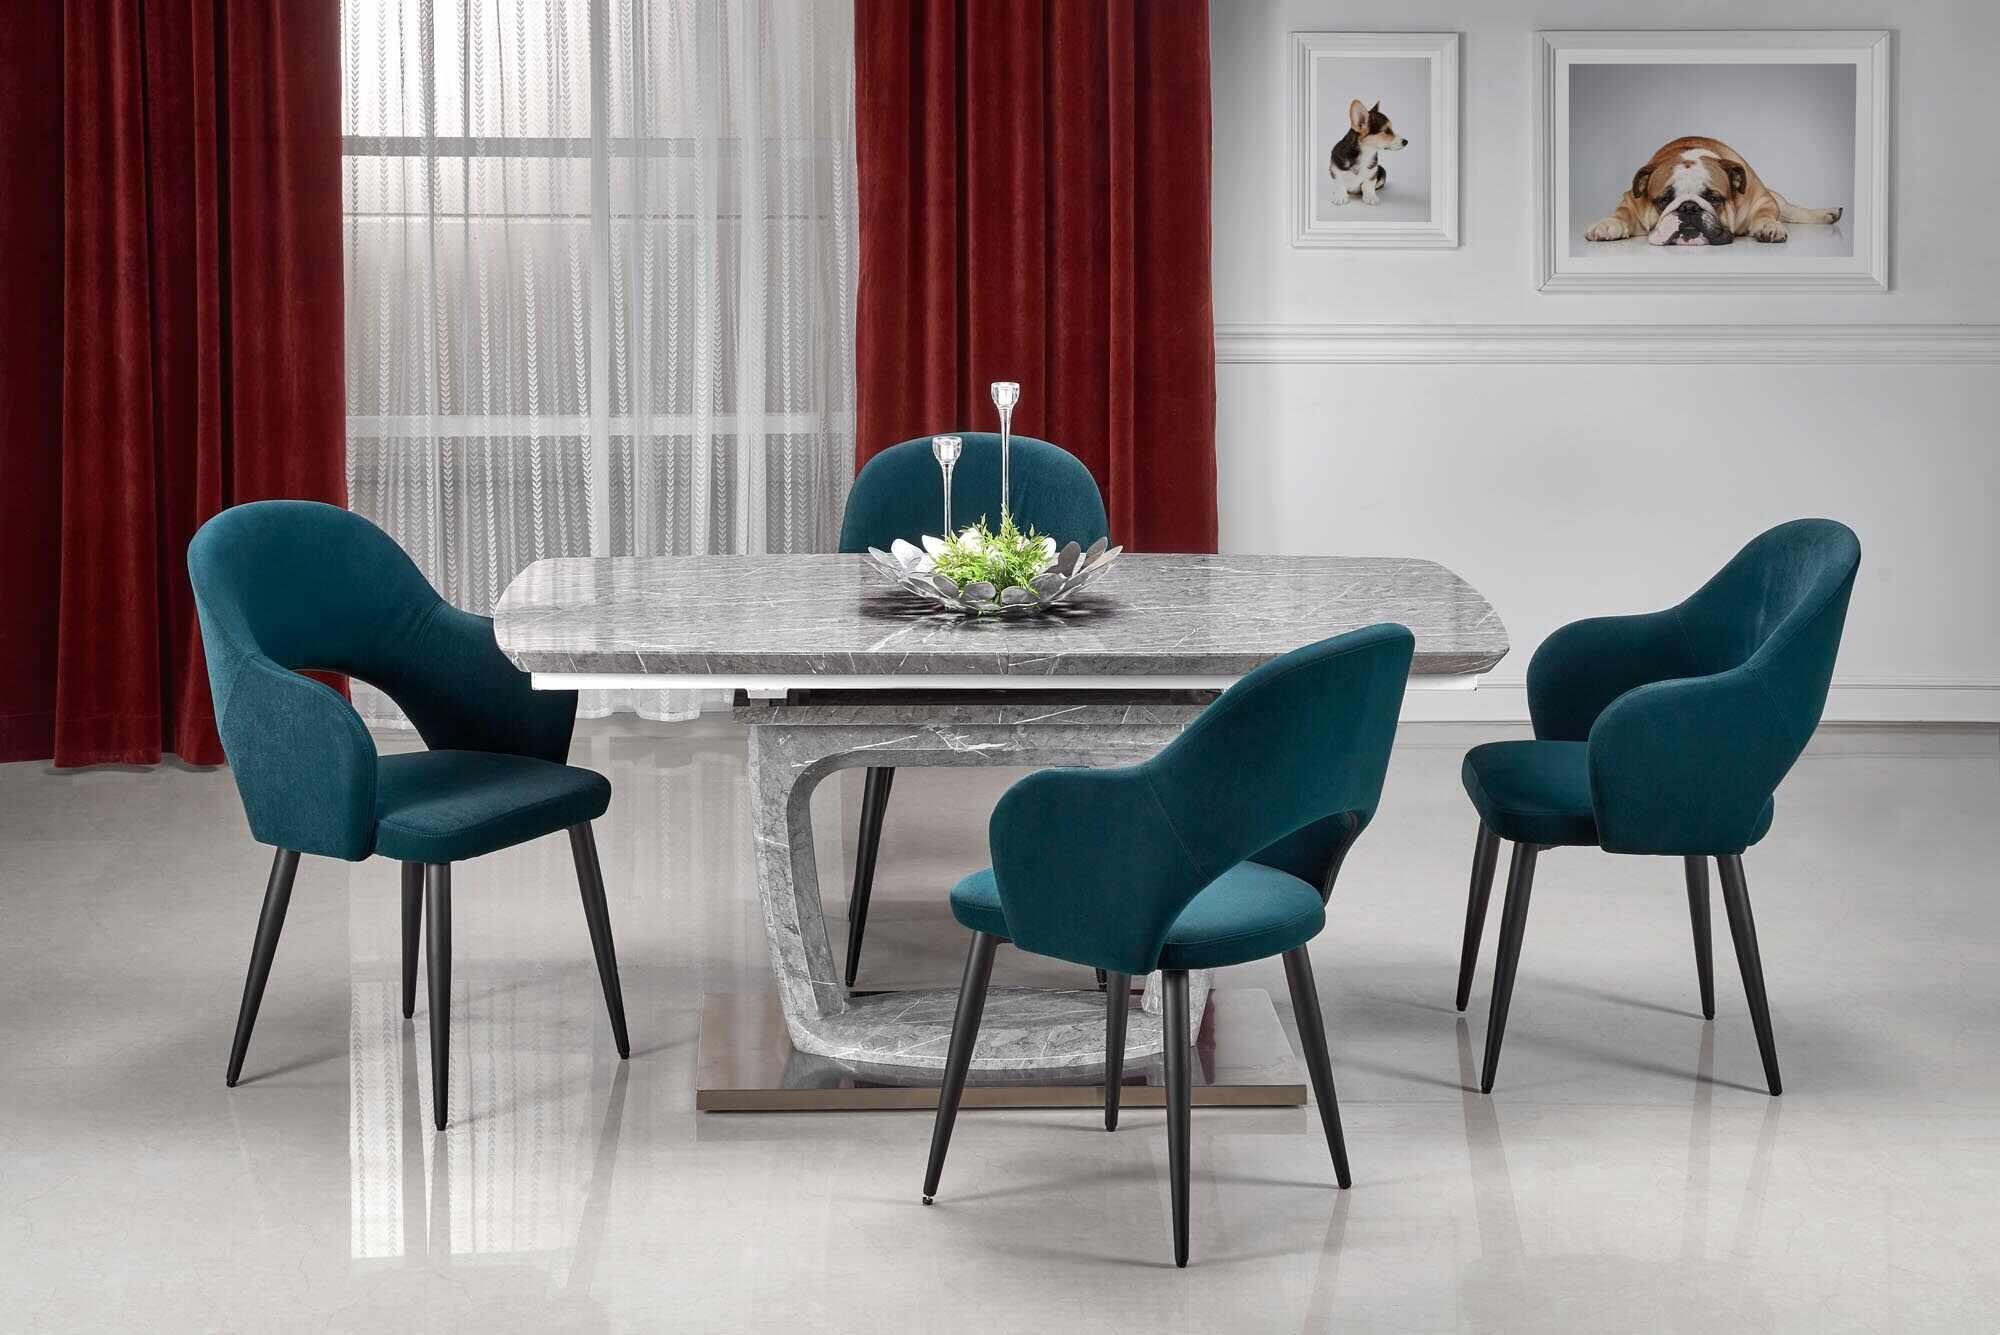 Set masa extensibila din MDF si metal Artemon Gri + 4 scaune tapitate cu stofa K364 Verde inchis / Negru, L160-220xl90xH76 cm la pret 4407 lei